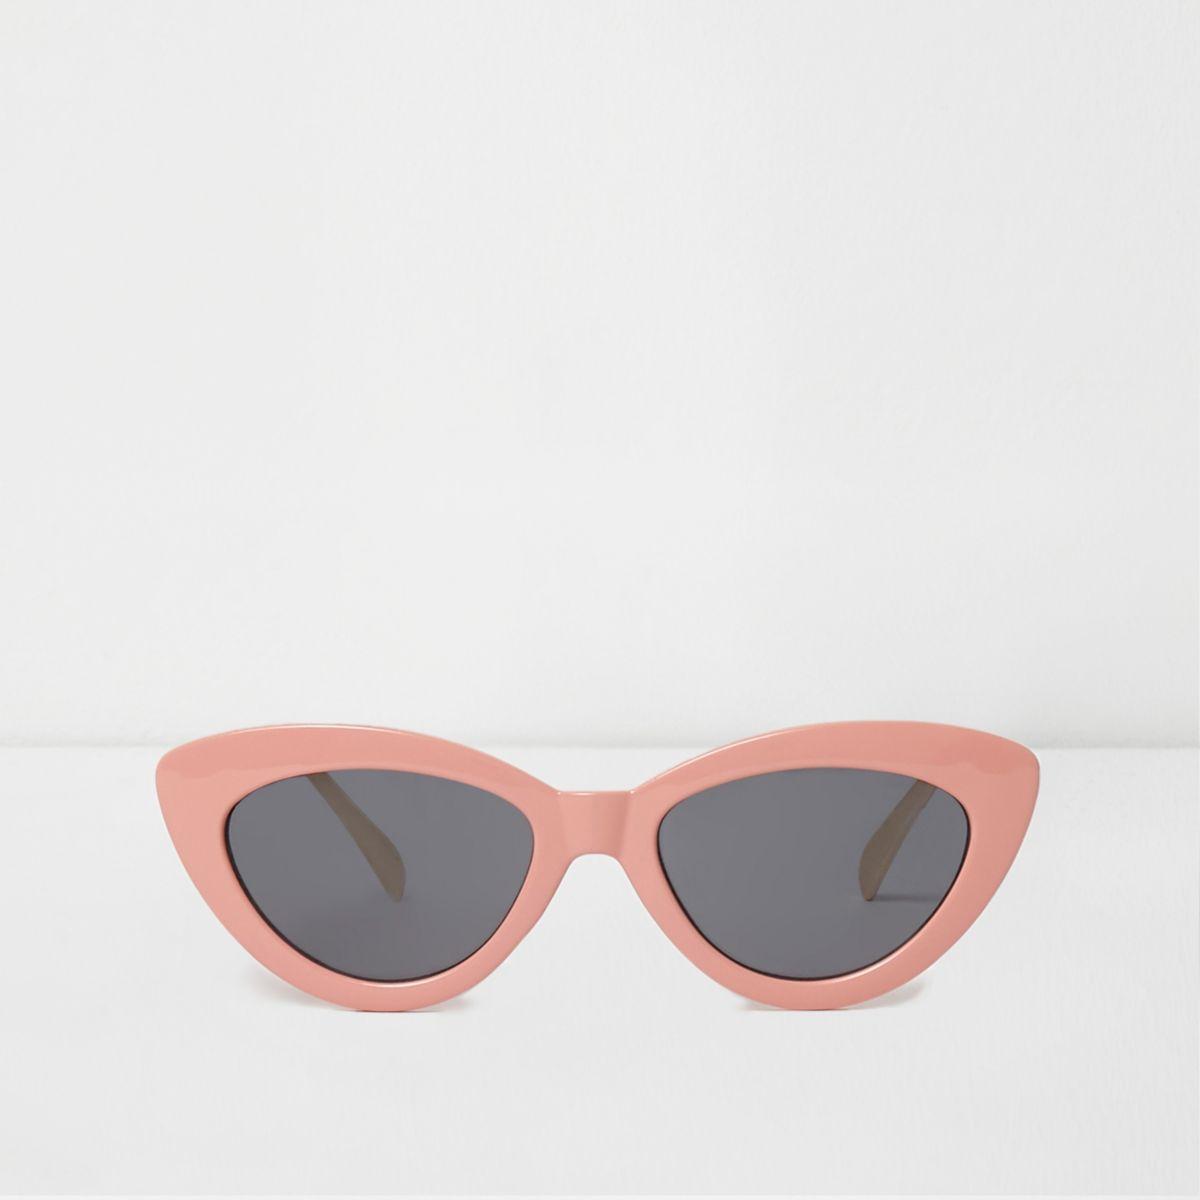 Pink cat eye smoke tinted lens sunglasses